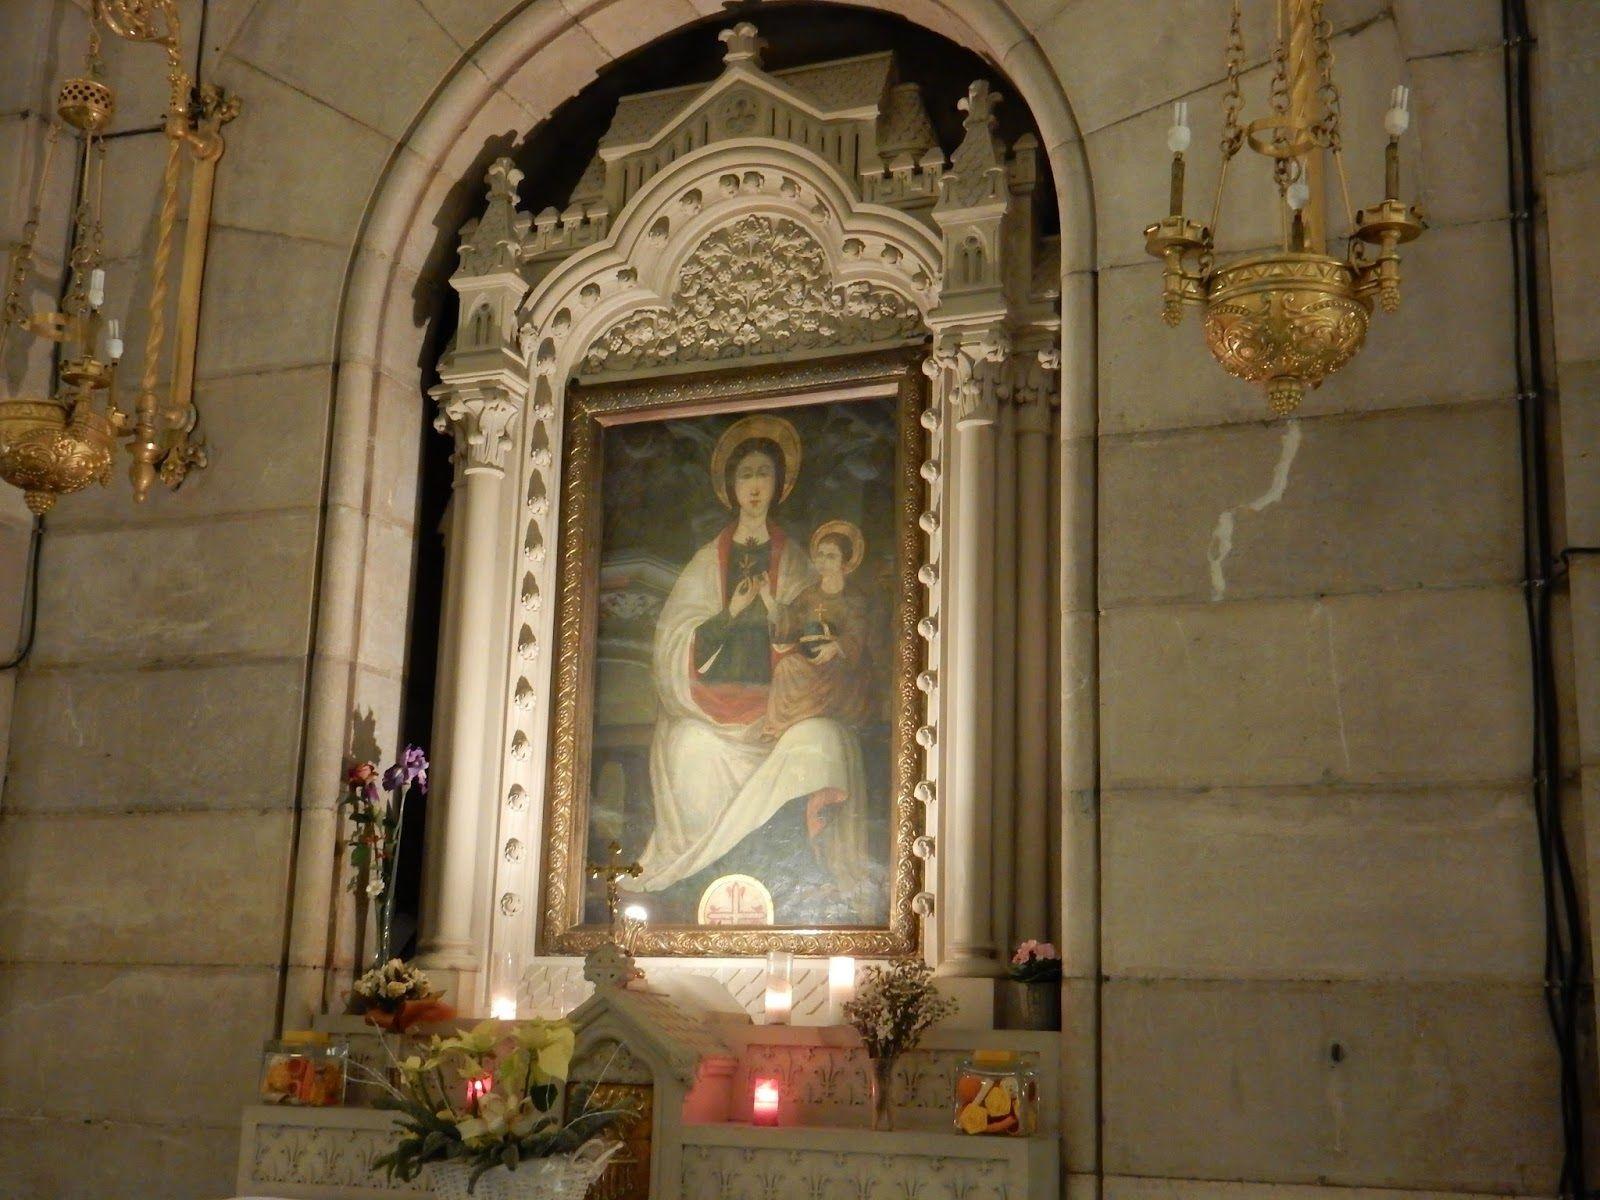 L2F Sep 19 pic Spain Madrid medieval Virgen del Lirio